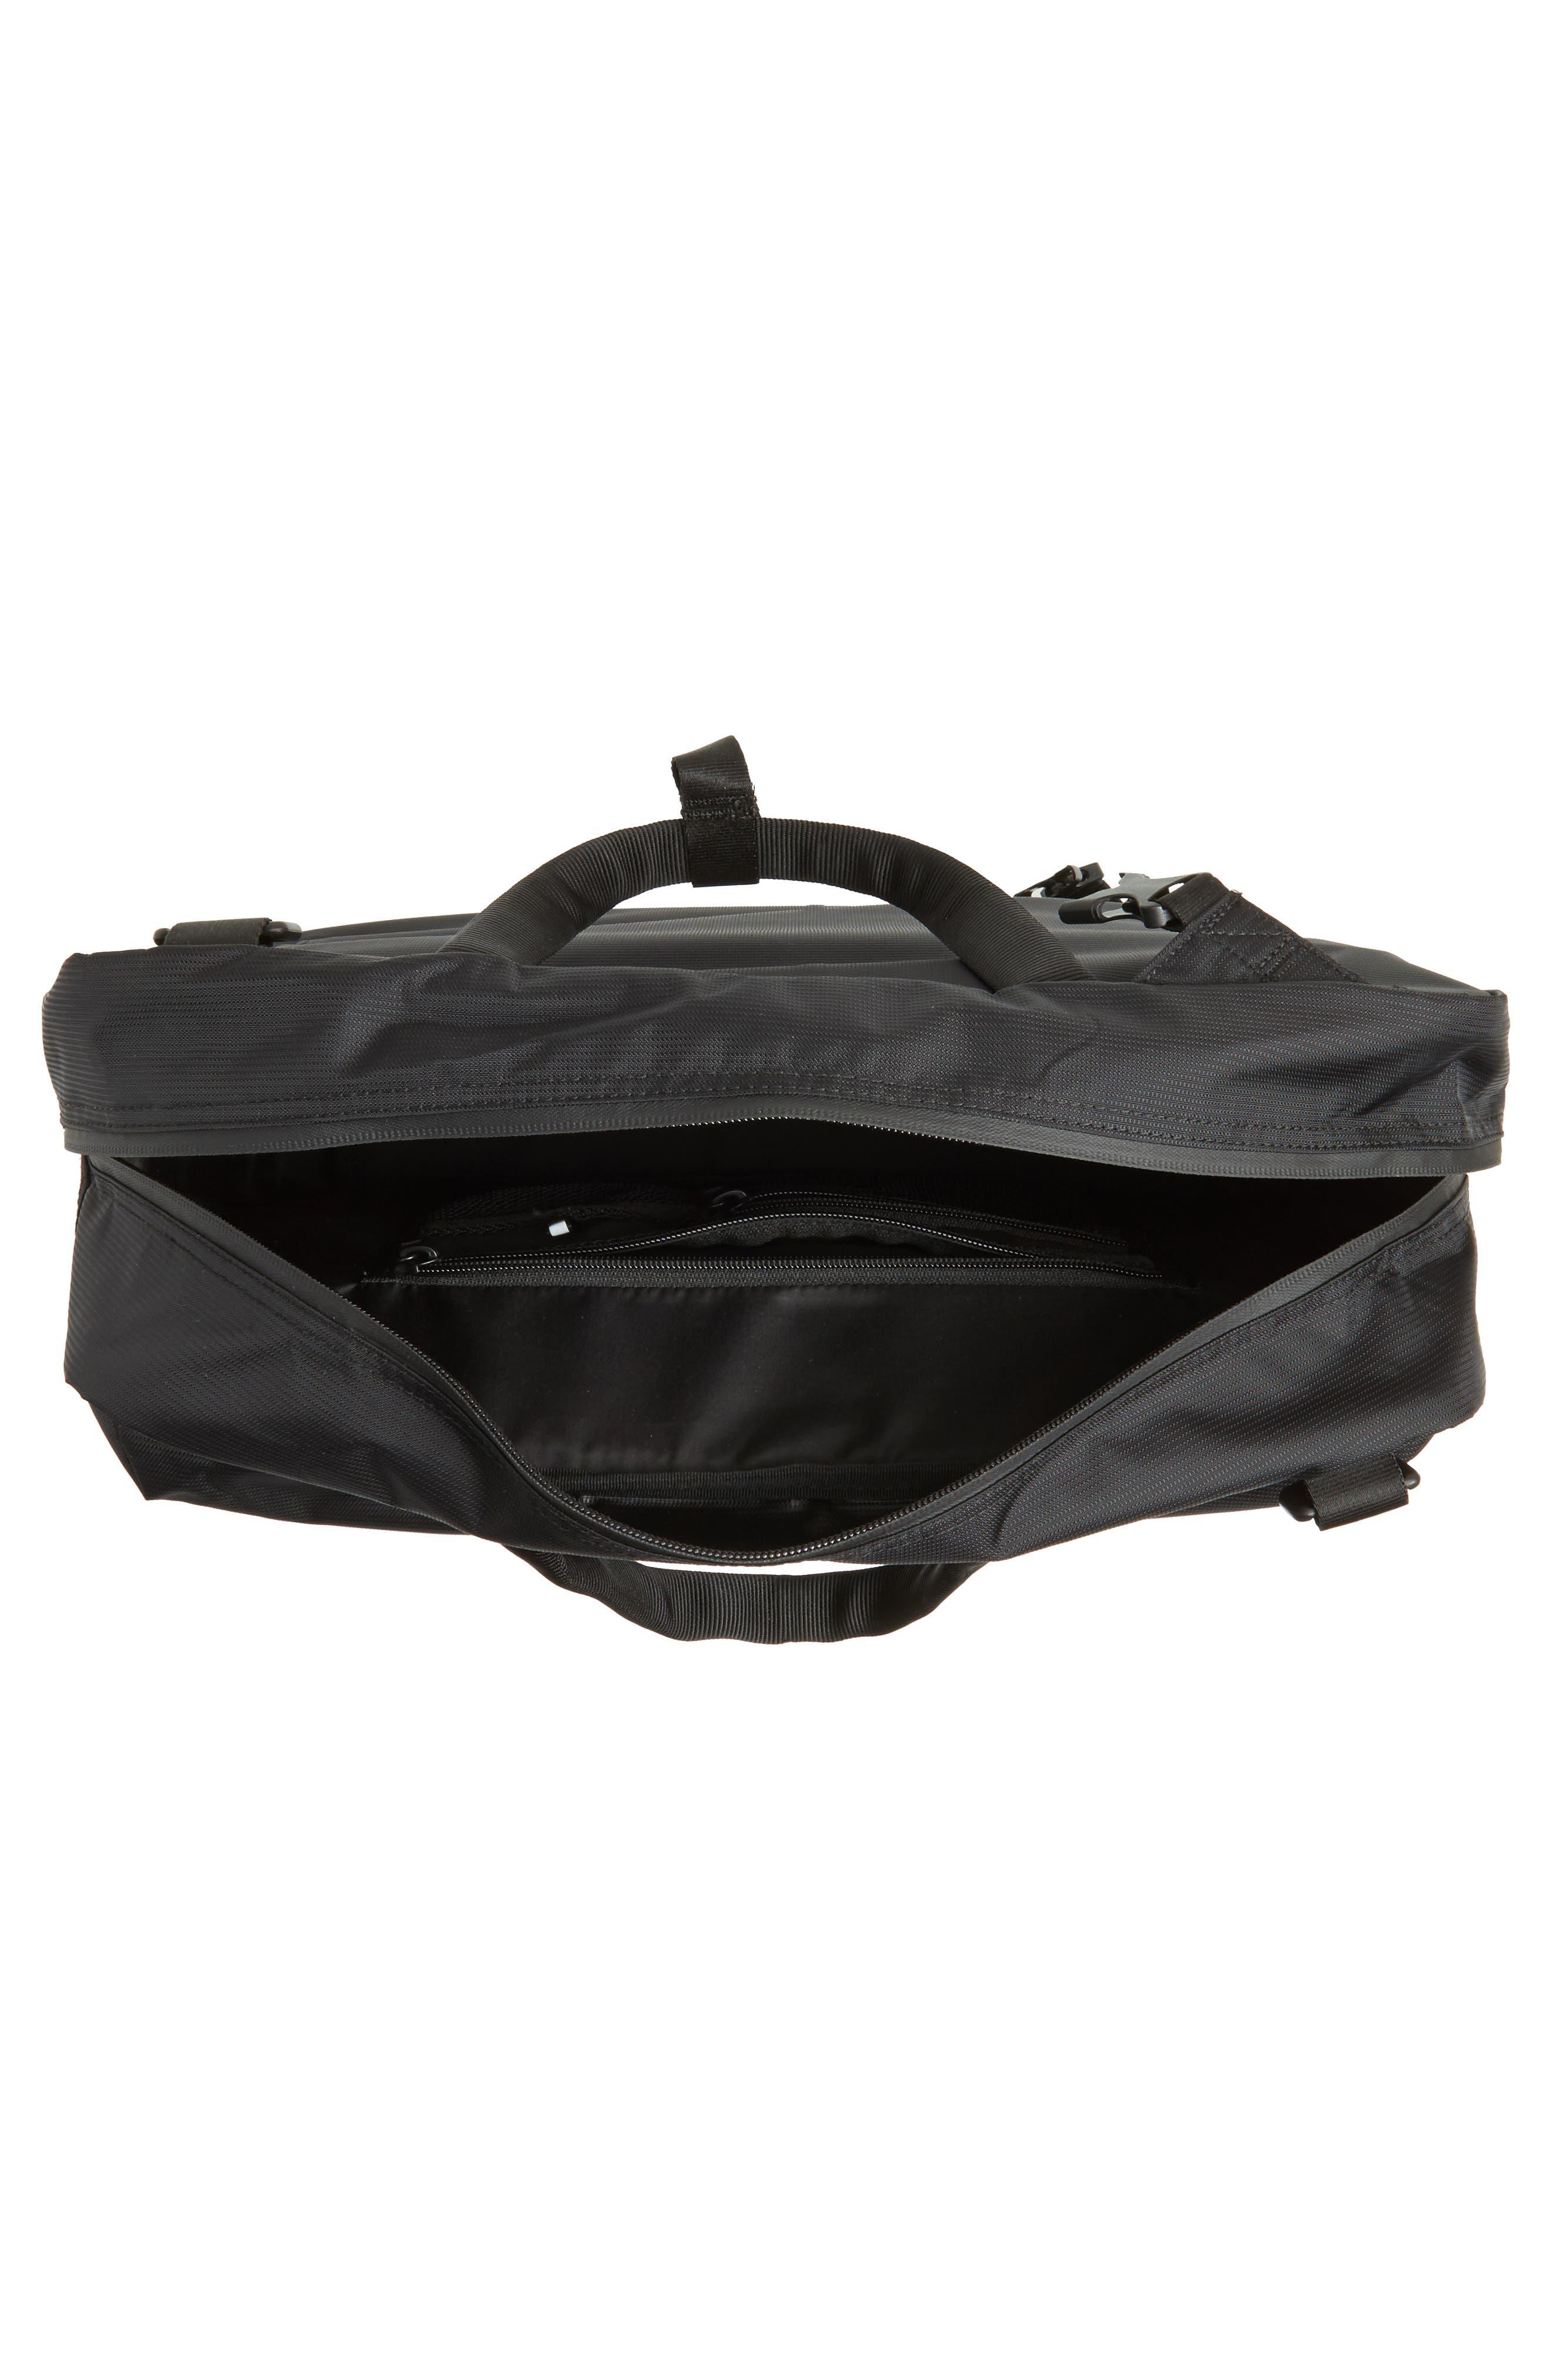 Britannia Convertible Messenger Bag,                             Alternate thumbnail 4, color,                             BLACK